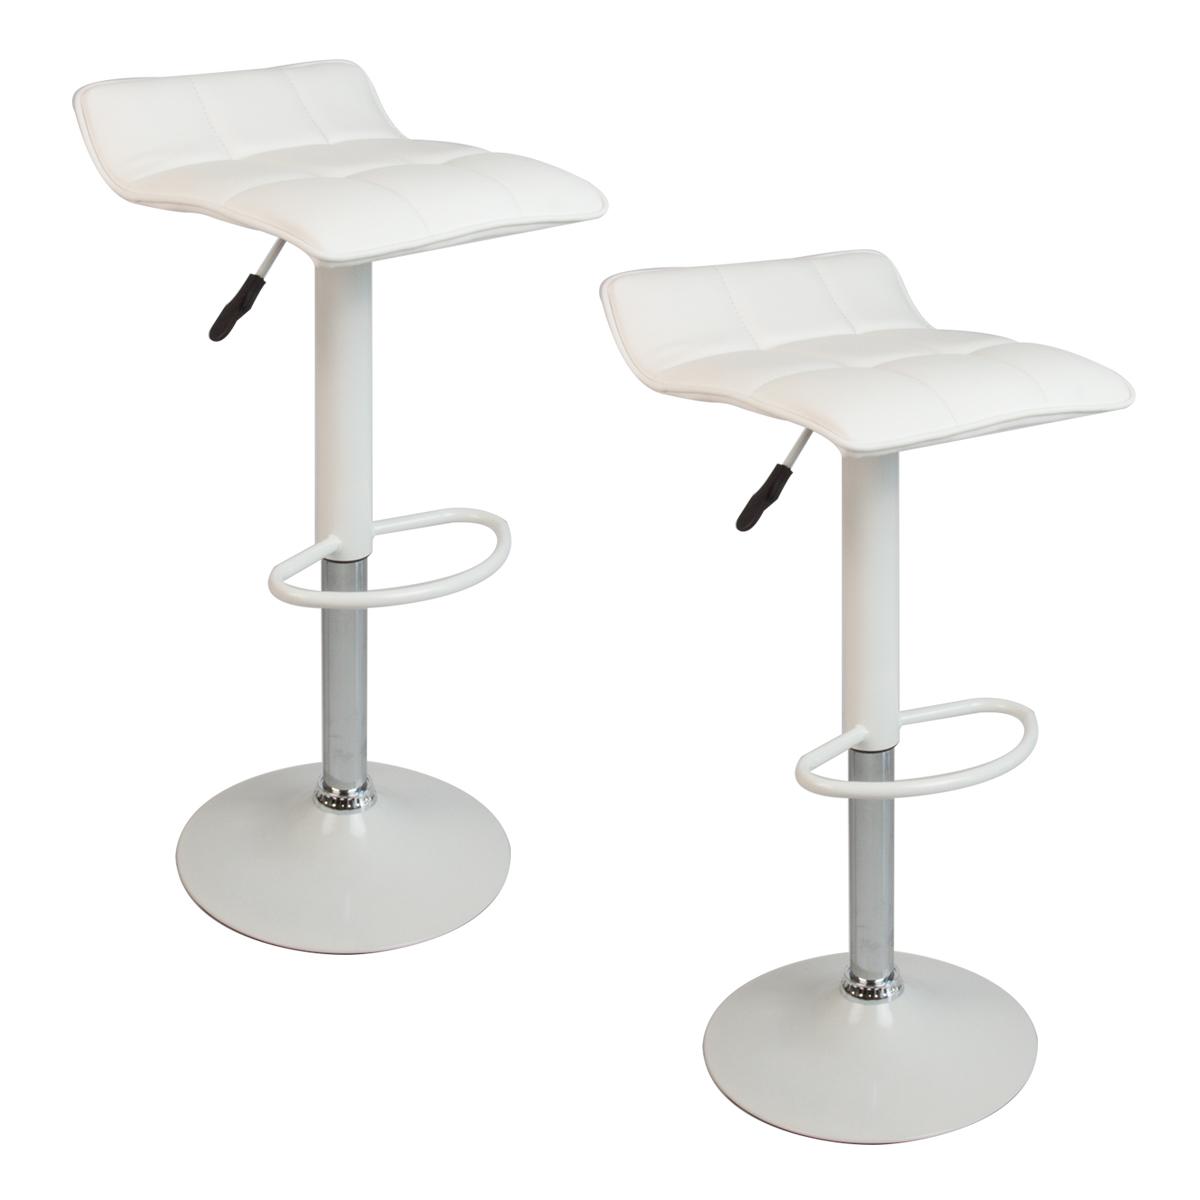 White Set Of 2 Bar Stools Leather Hydraulic Swivel  : 41440ad from www.ebay.com size 1200 x 1200 jpeg 169kB